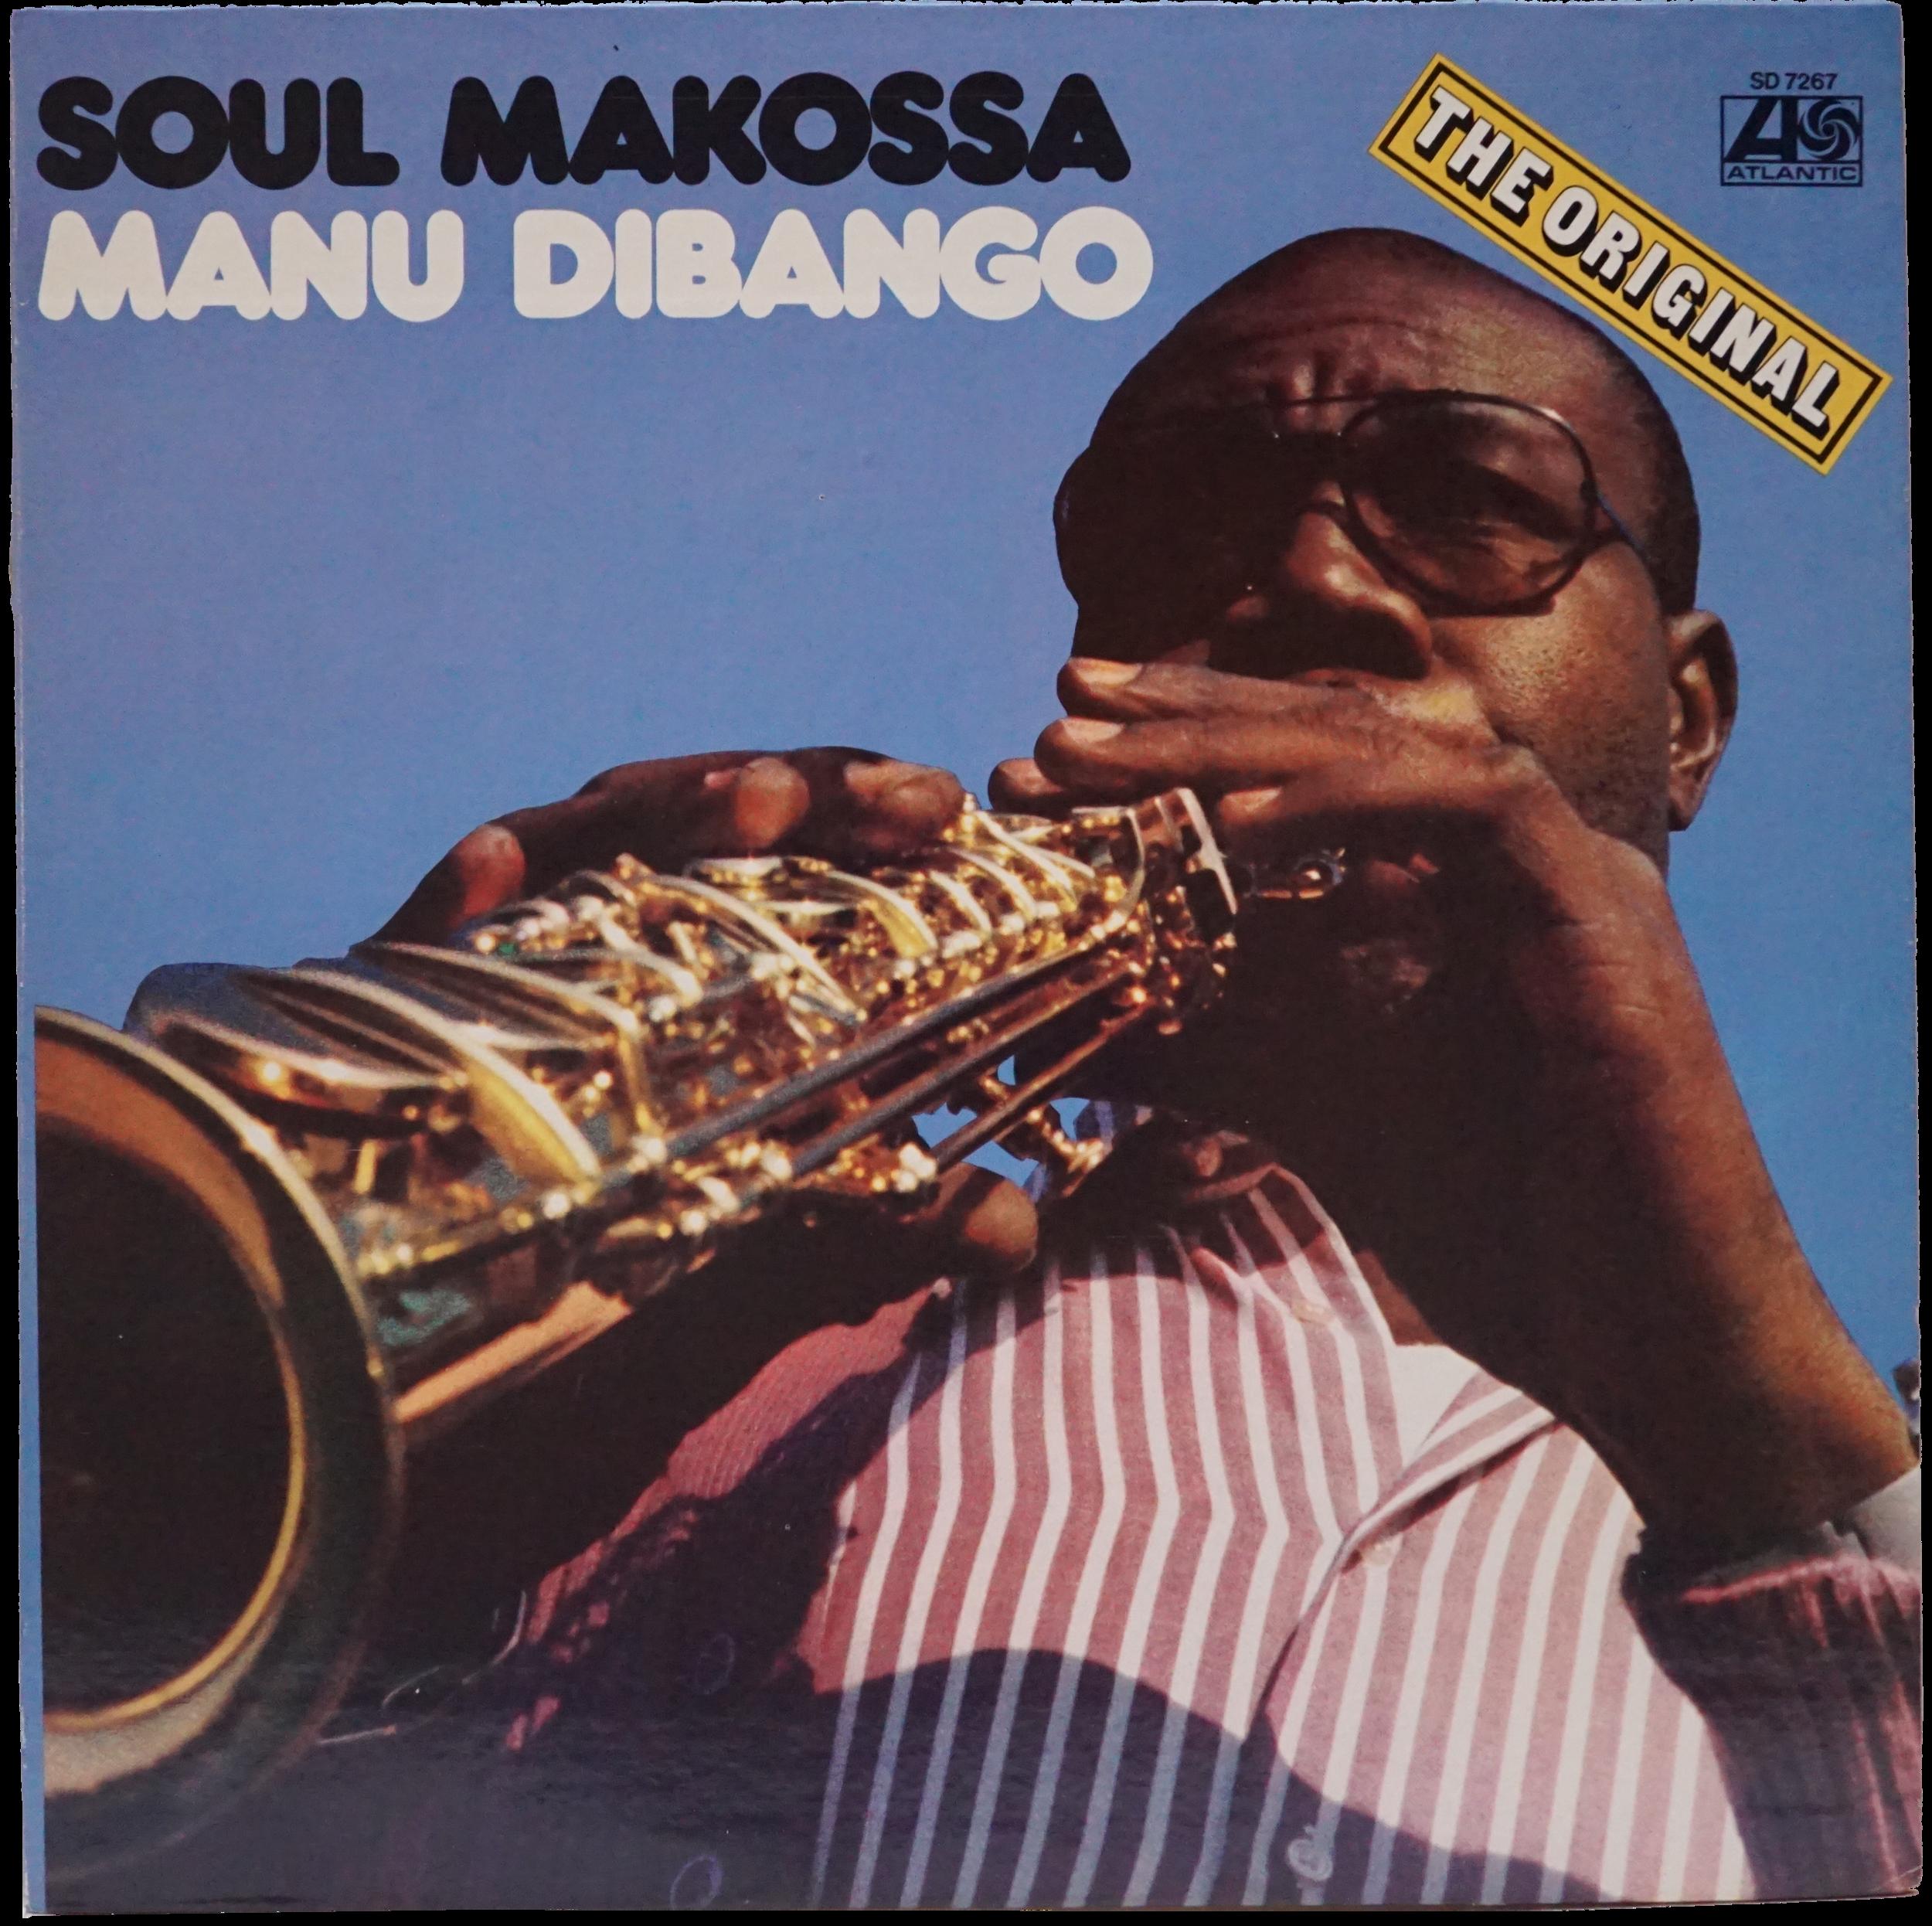 WLWLTDOO-1973-LP-MANU_DIBANGO-SOUL_MAKOSSA-FRONT.png